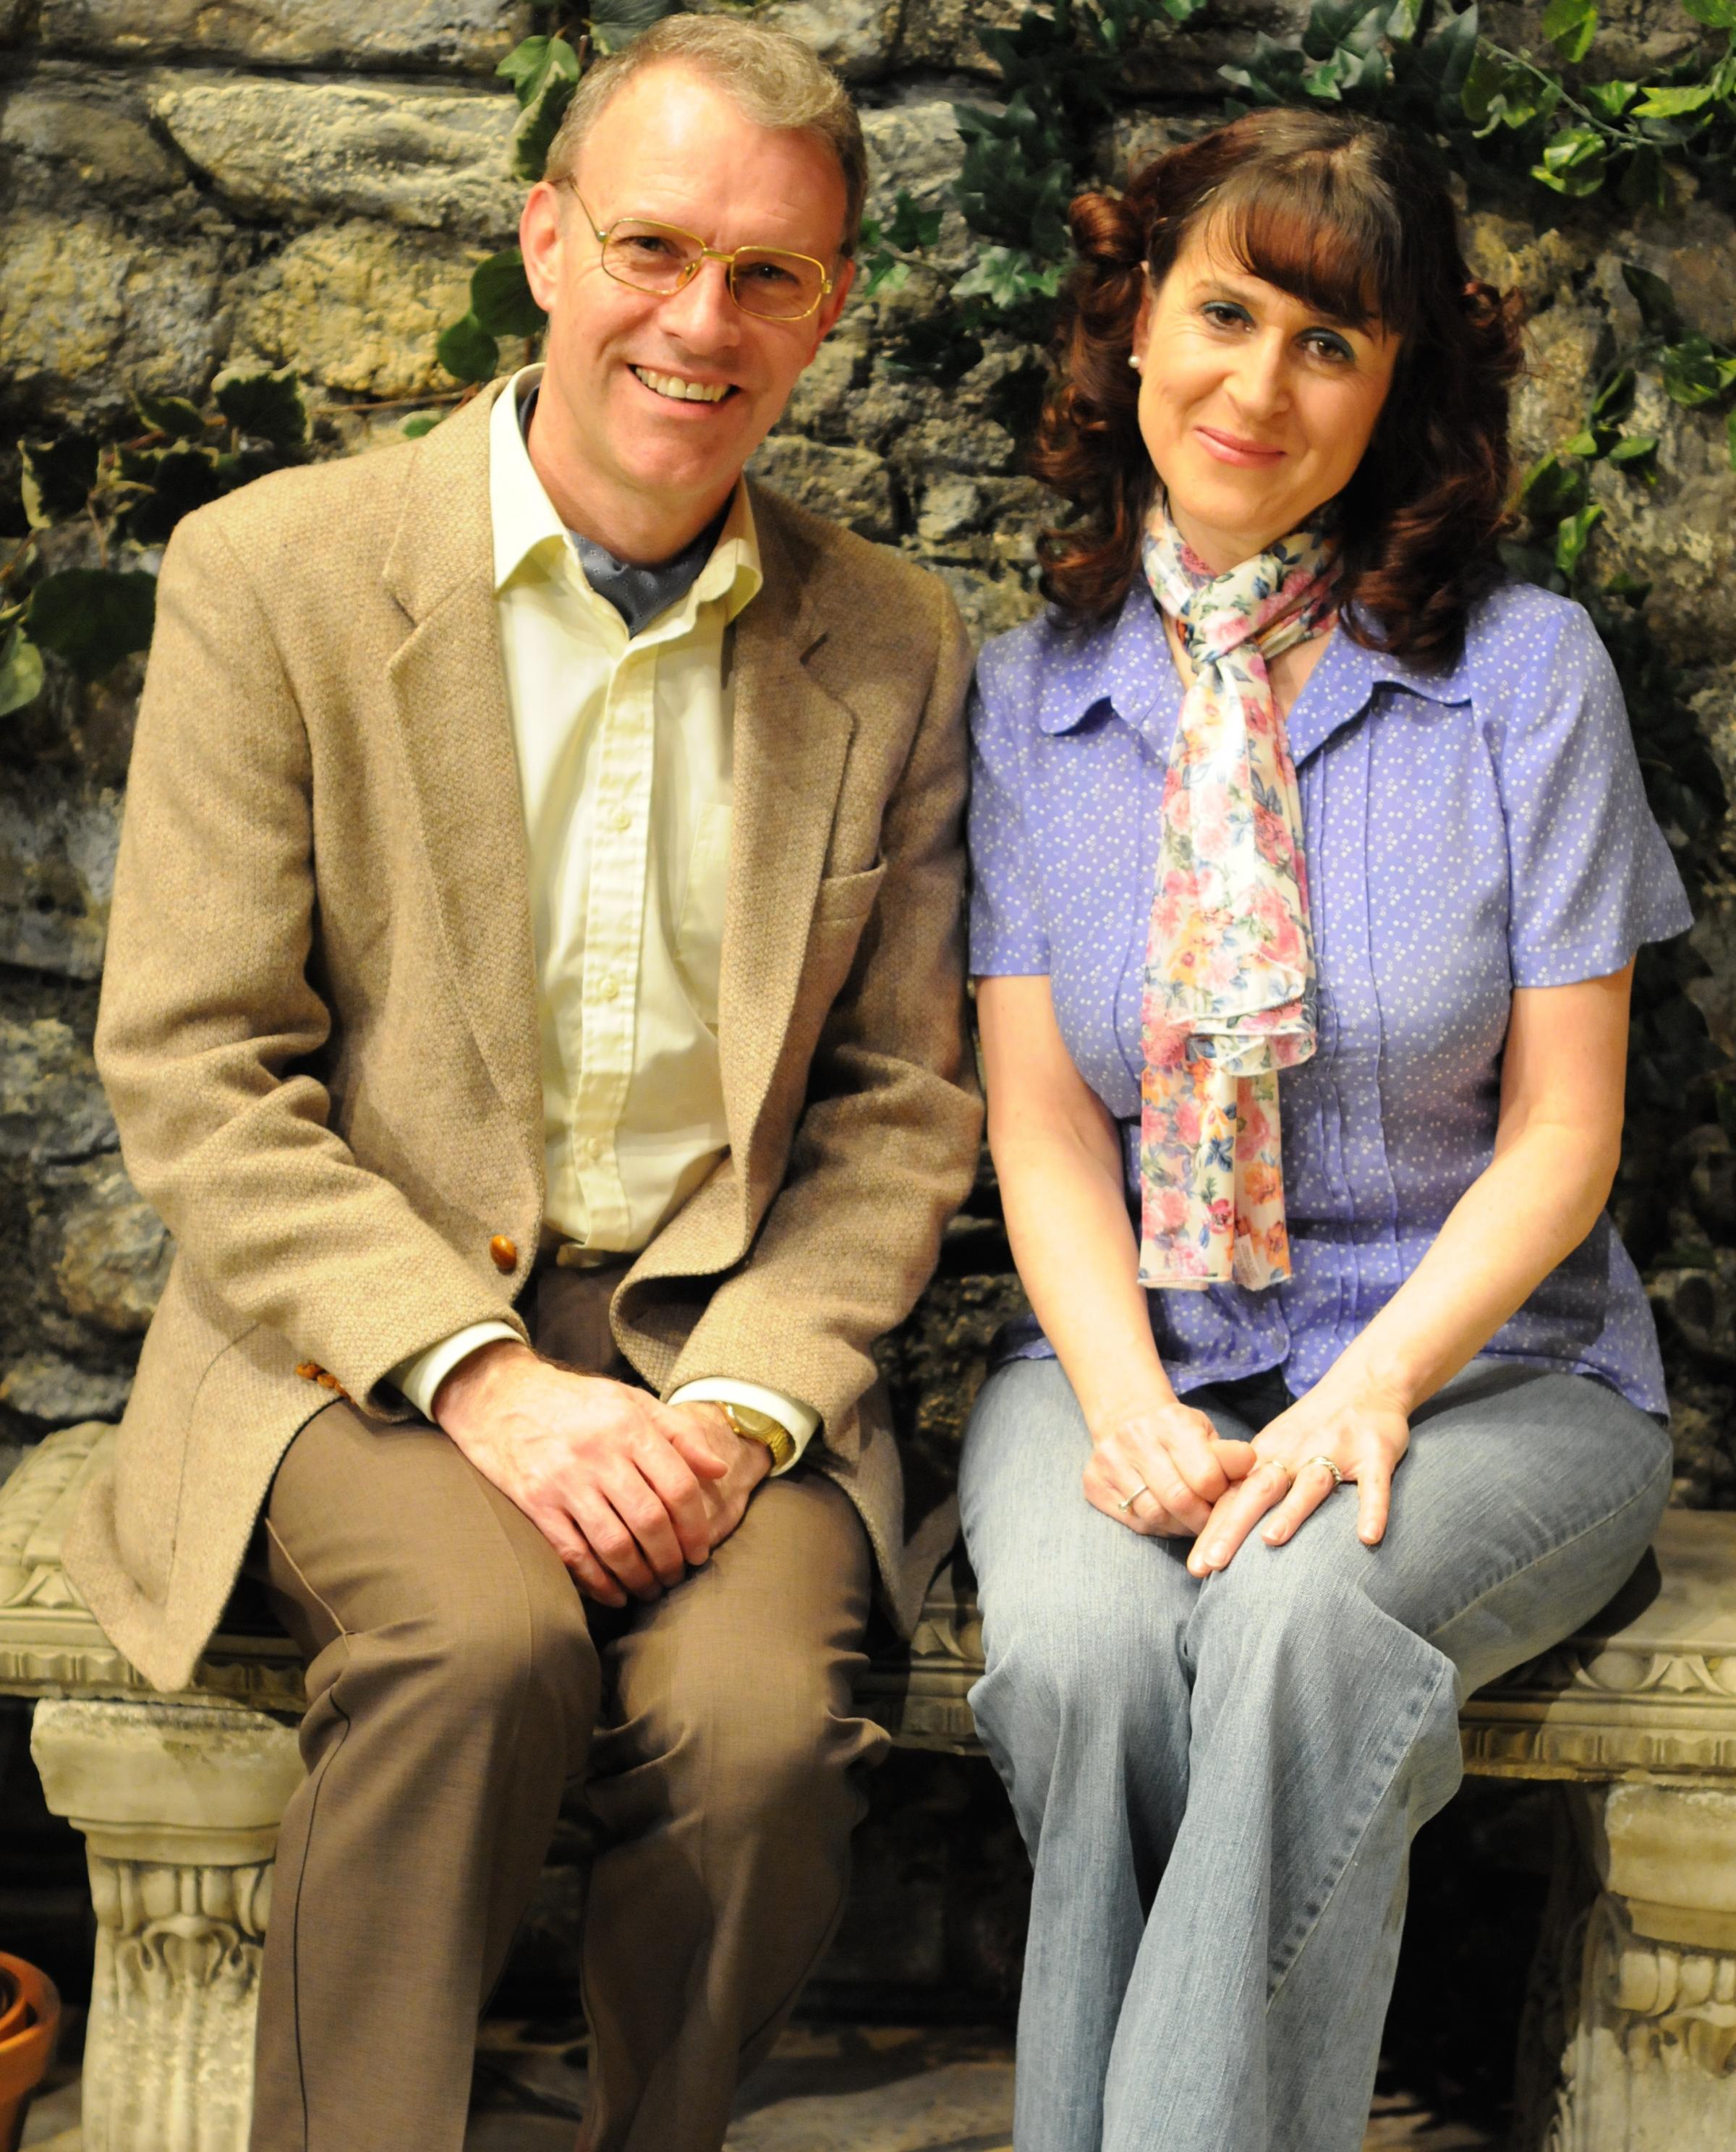 Helen Craig (actress),Amanda Douge Hot pics Maudie Dunham,Keeley Hawes (born 1976)